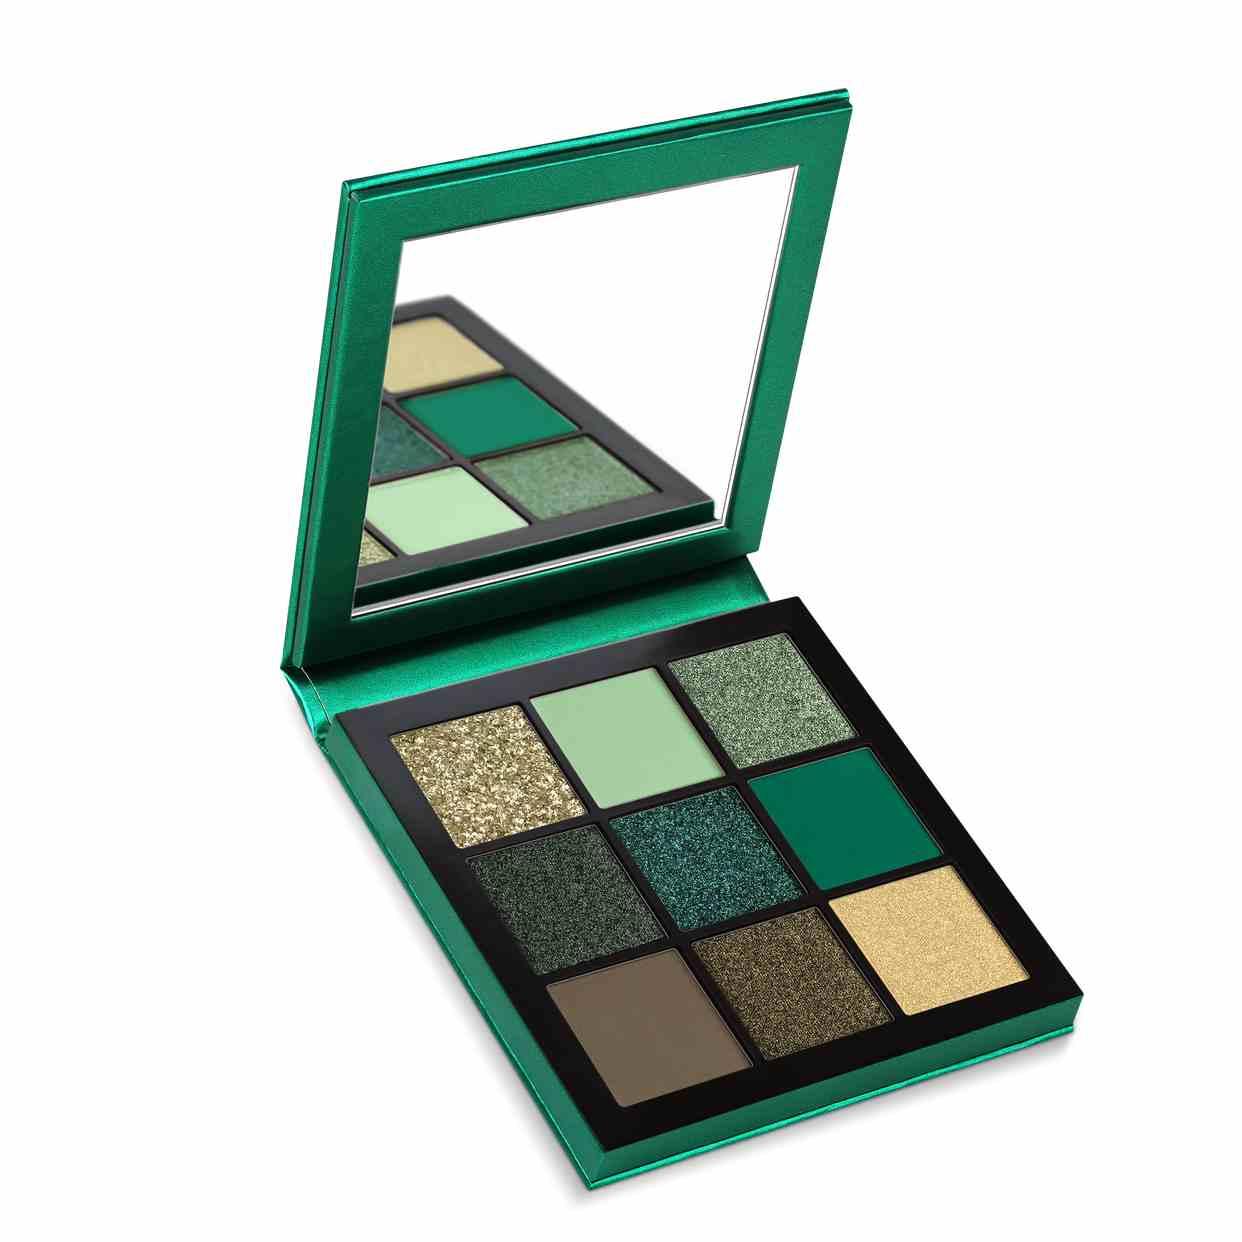 Paleta de sombra Emerald | Huda Beauty